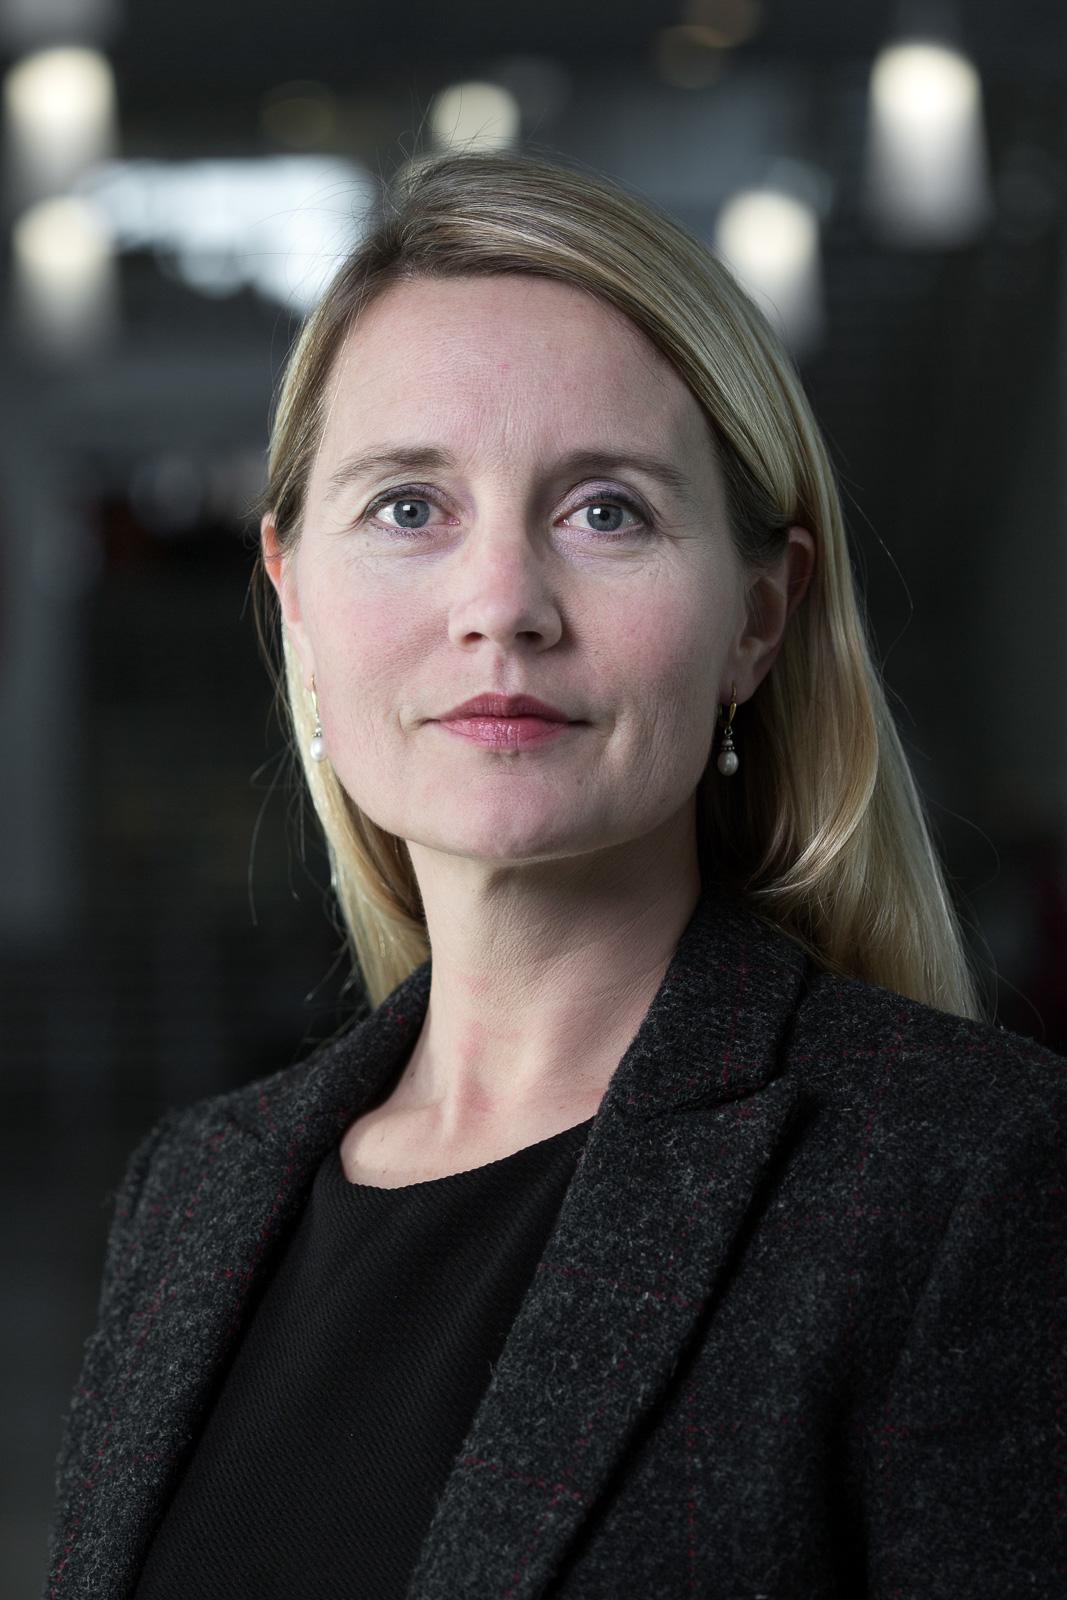 Helle Alsted Søndergaard